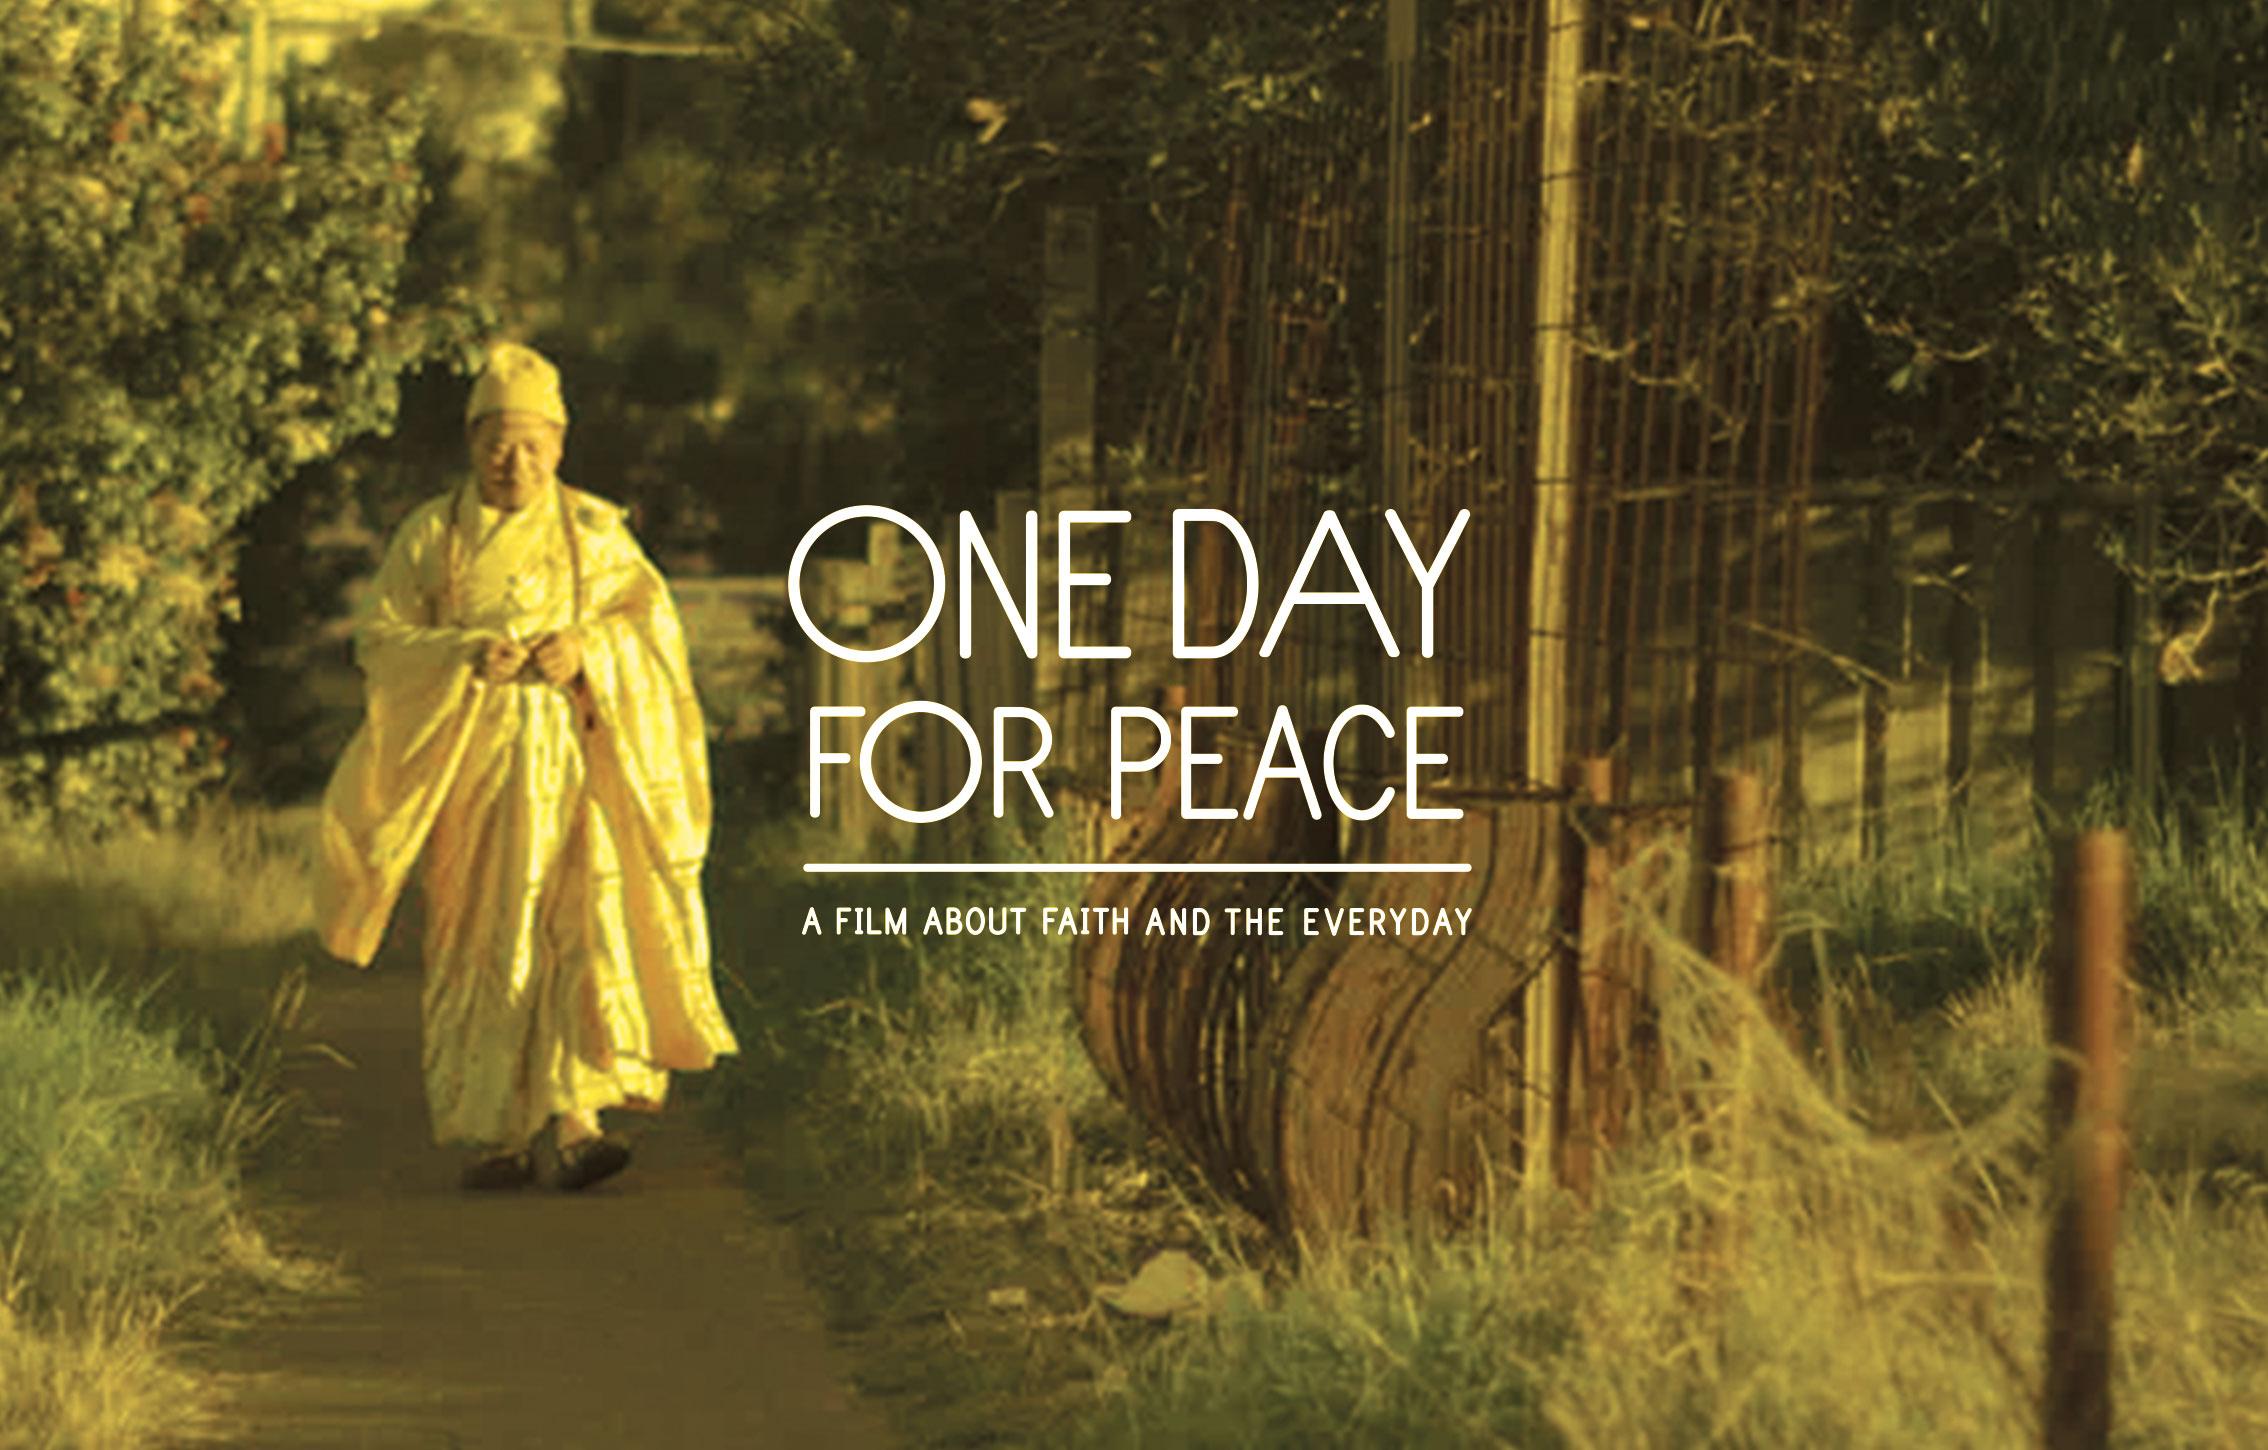 UTP-One-Day-For-Peace-Hero-Image-Web-Revised.jpg